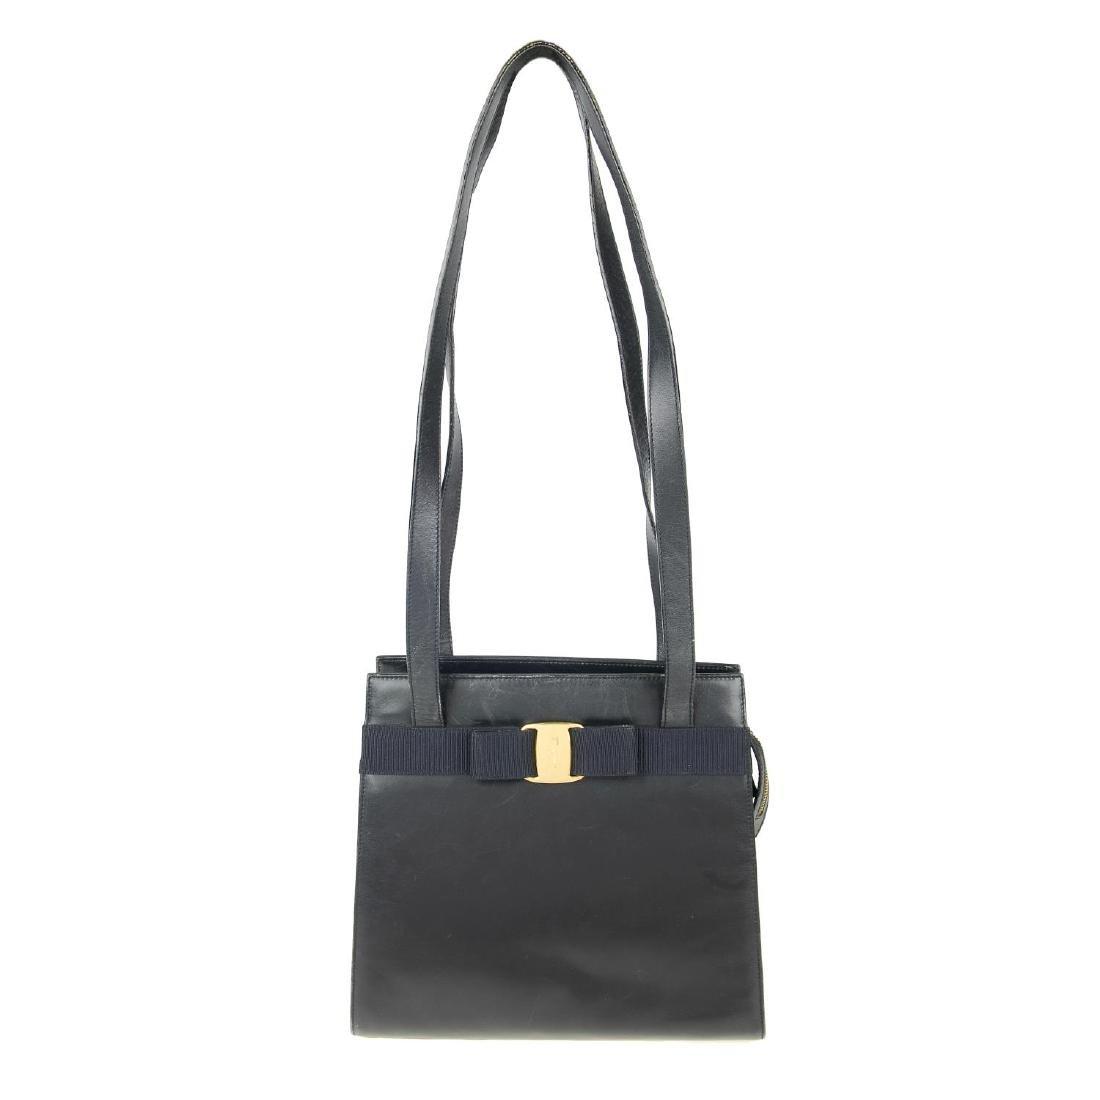 SALVATORE FERRAGAMO - a small Vara handbag. Designed